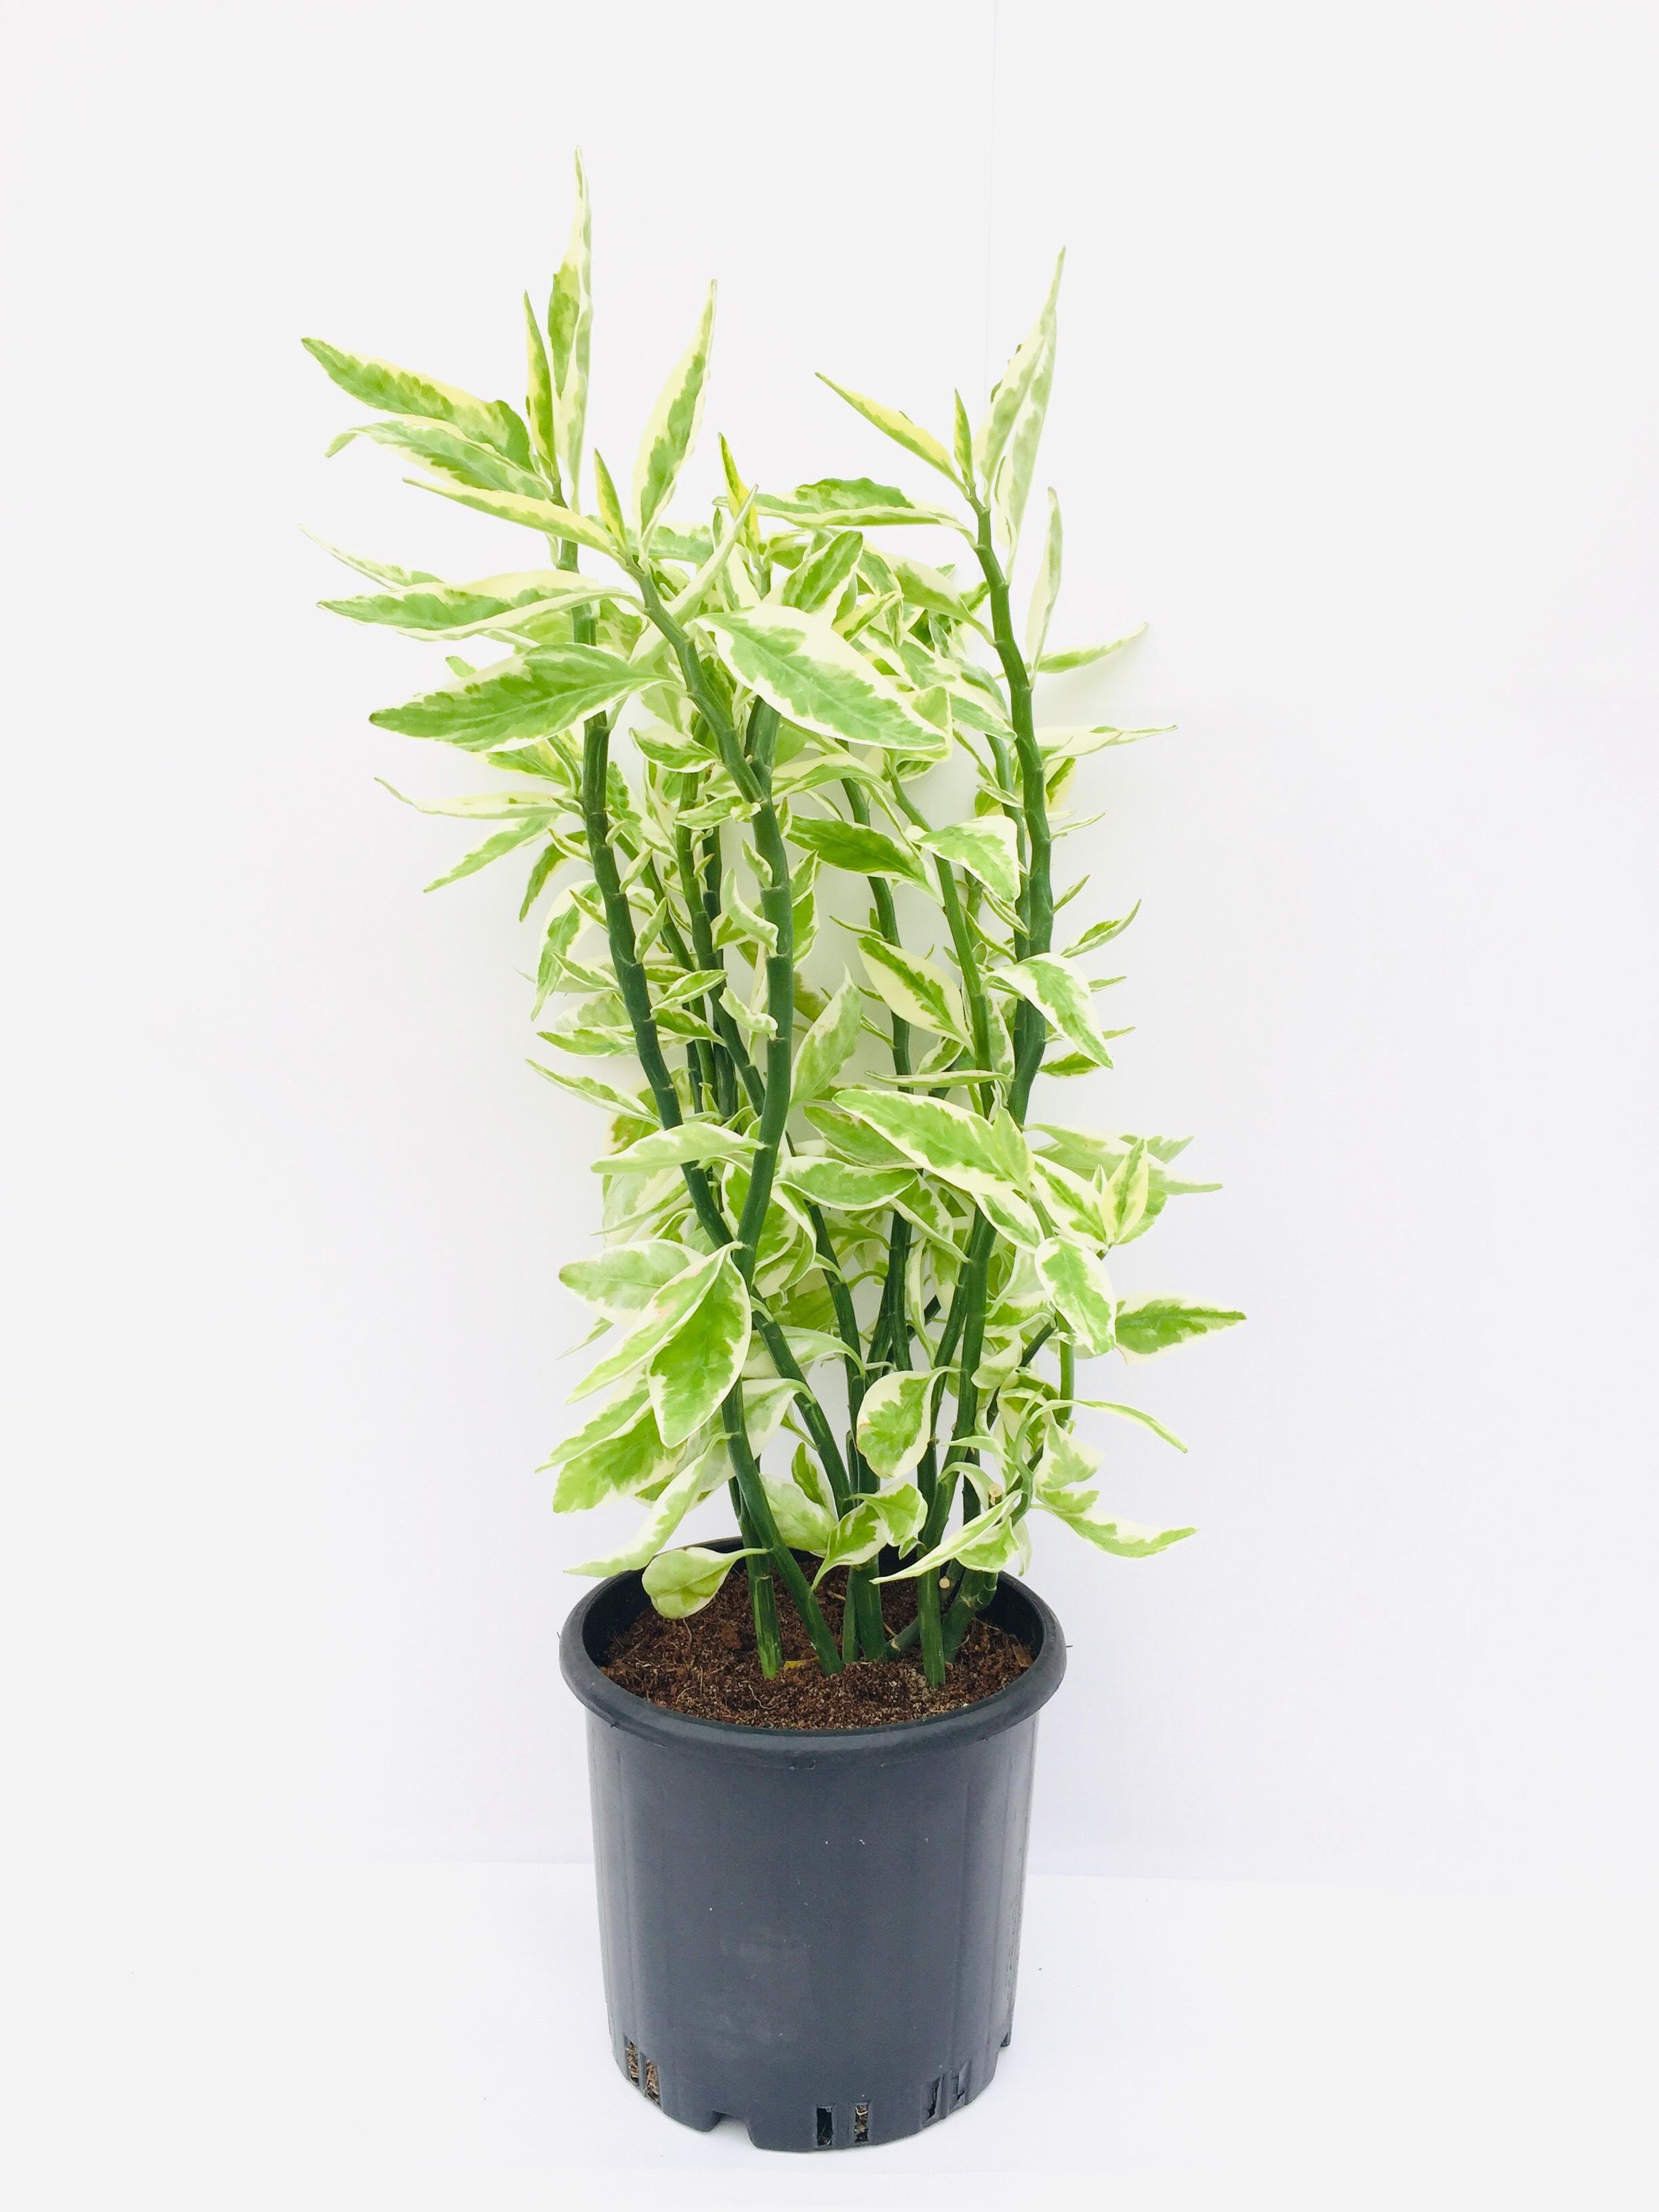 Pedilanthus Tithymaloides Outdoor Plants